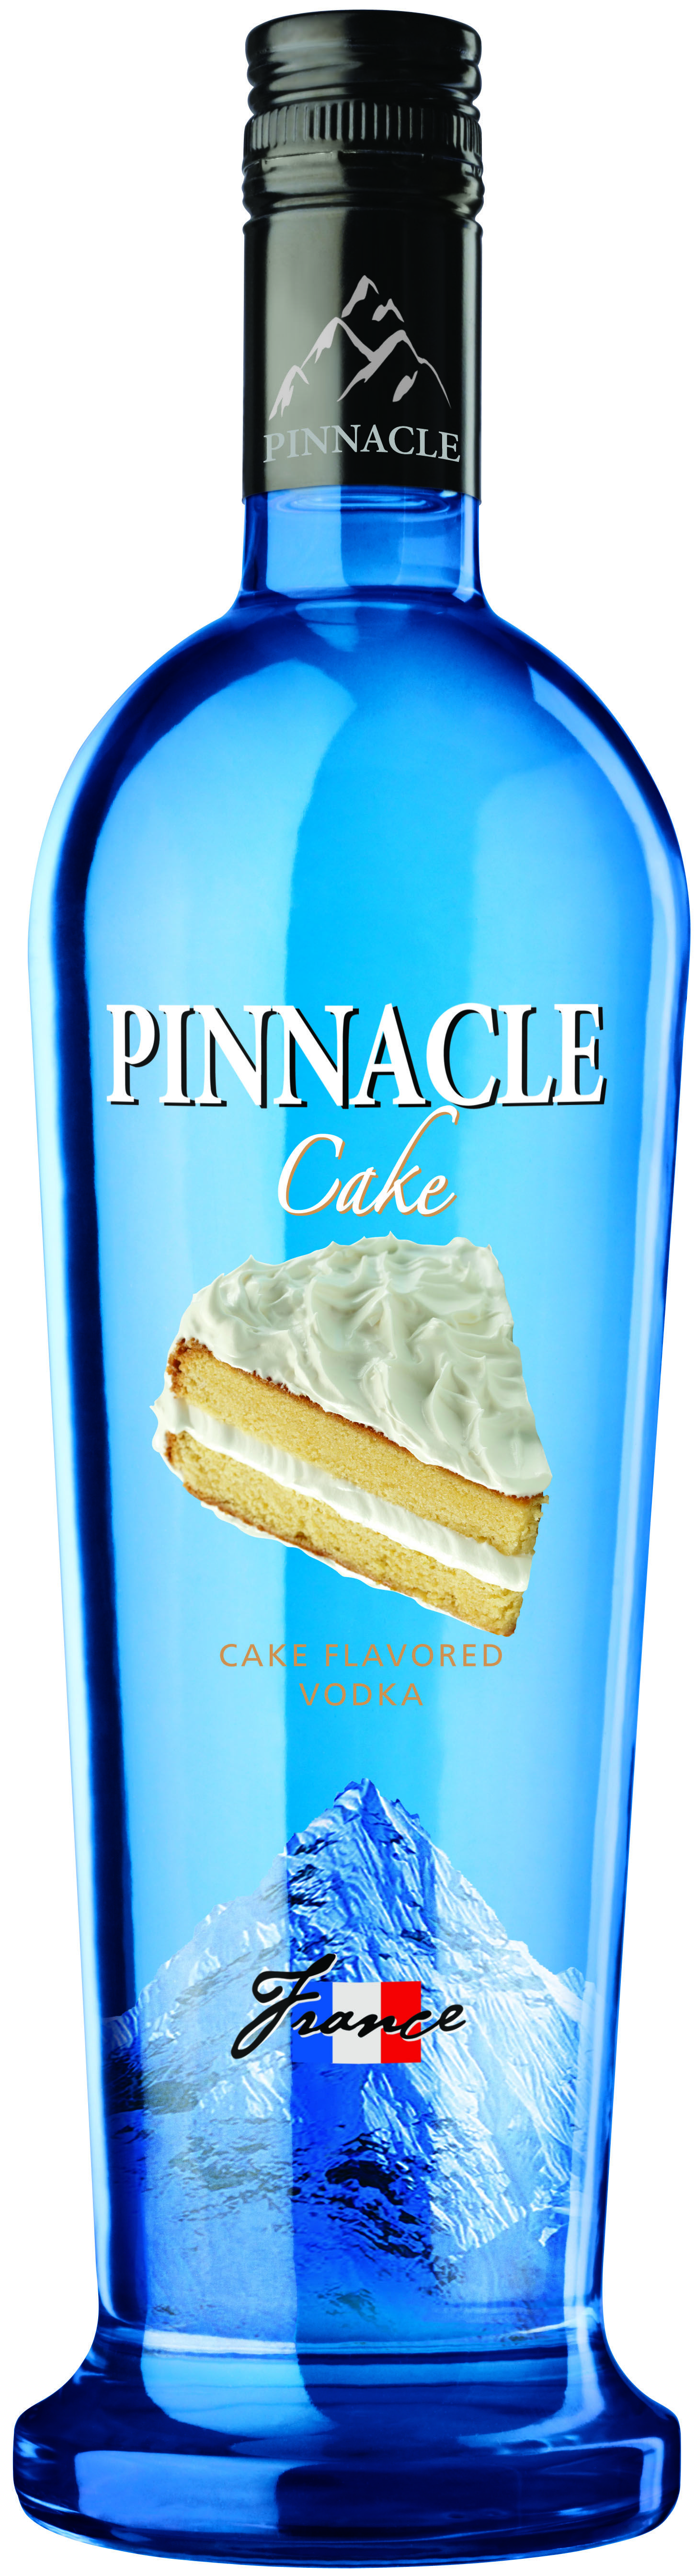 Pinnacle cake recipes PINNACLE Pinterest Cake Liquor shots